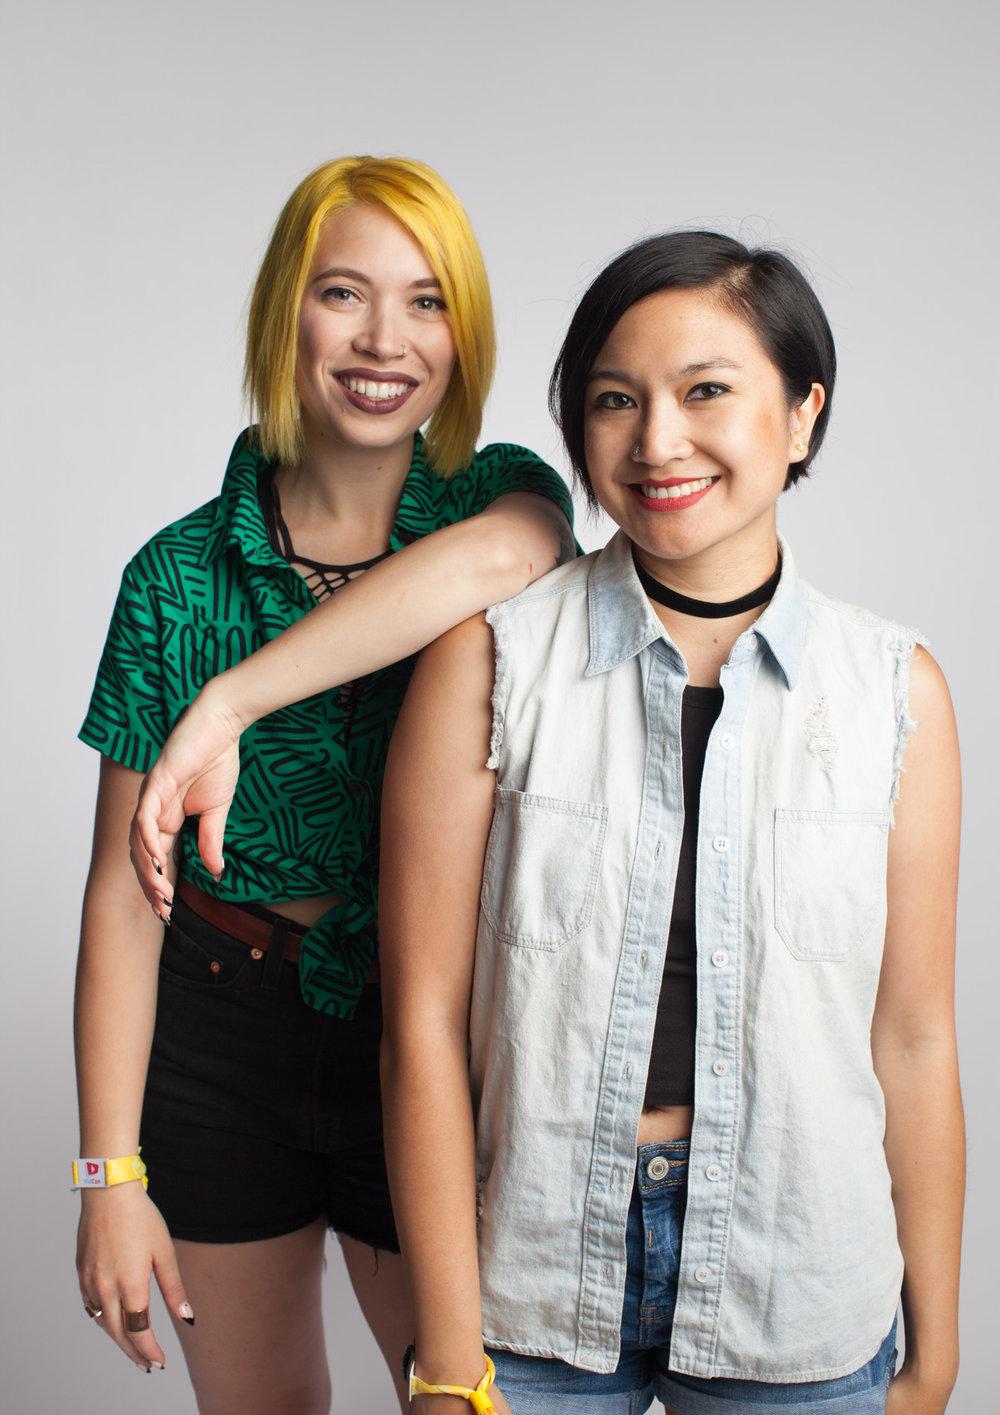 Megan Toenyes & Sapphire Sandalo